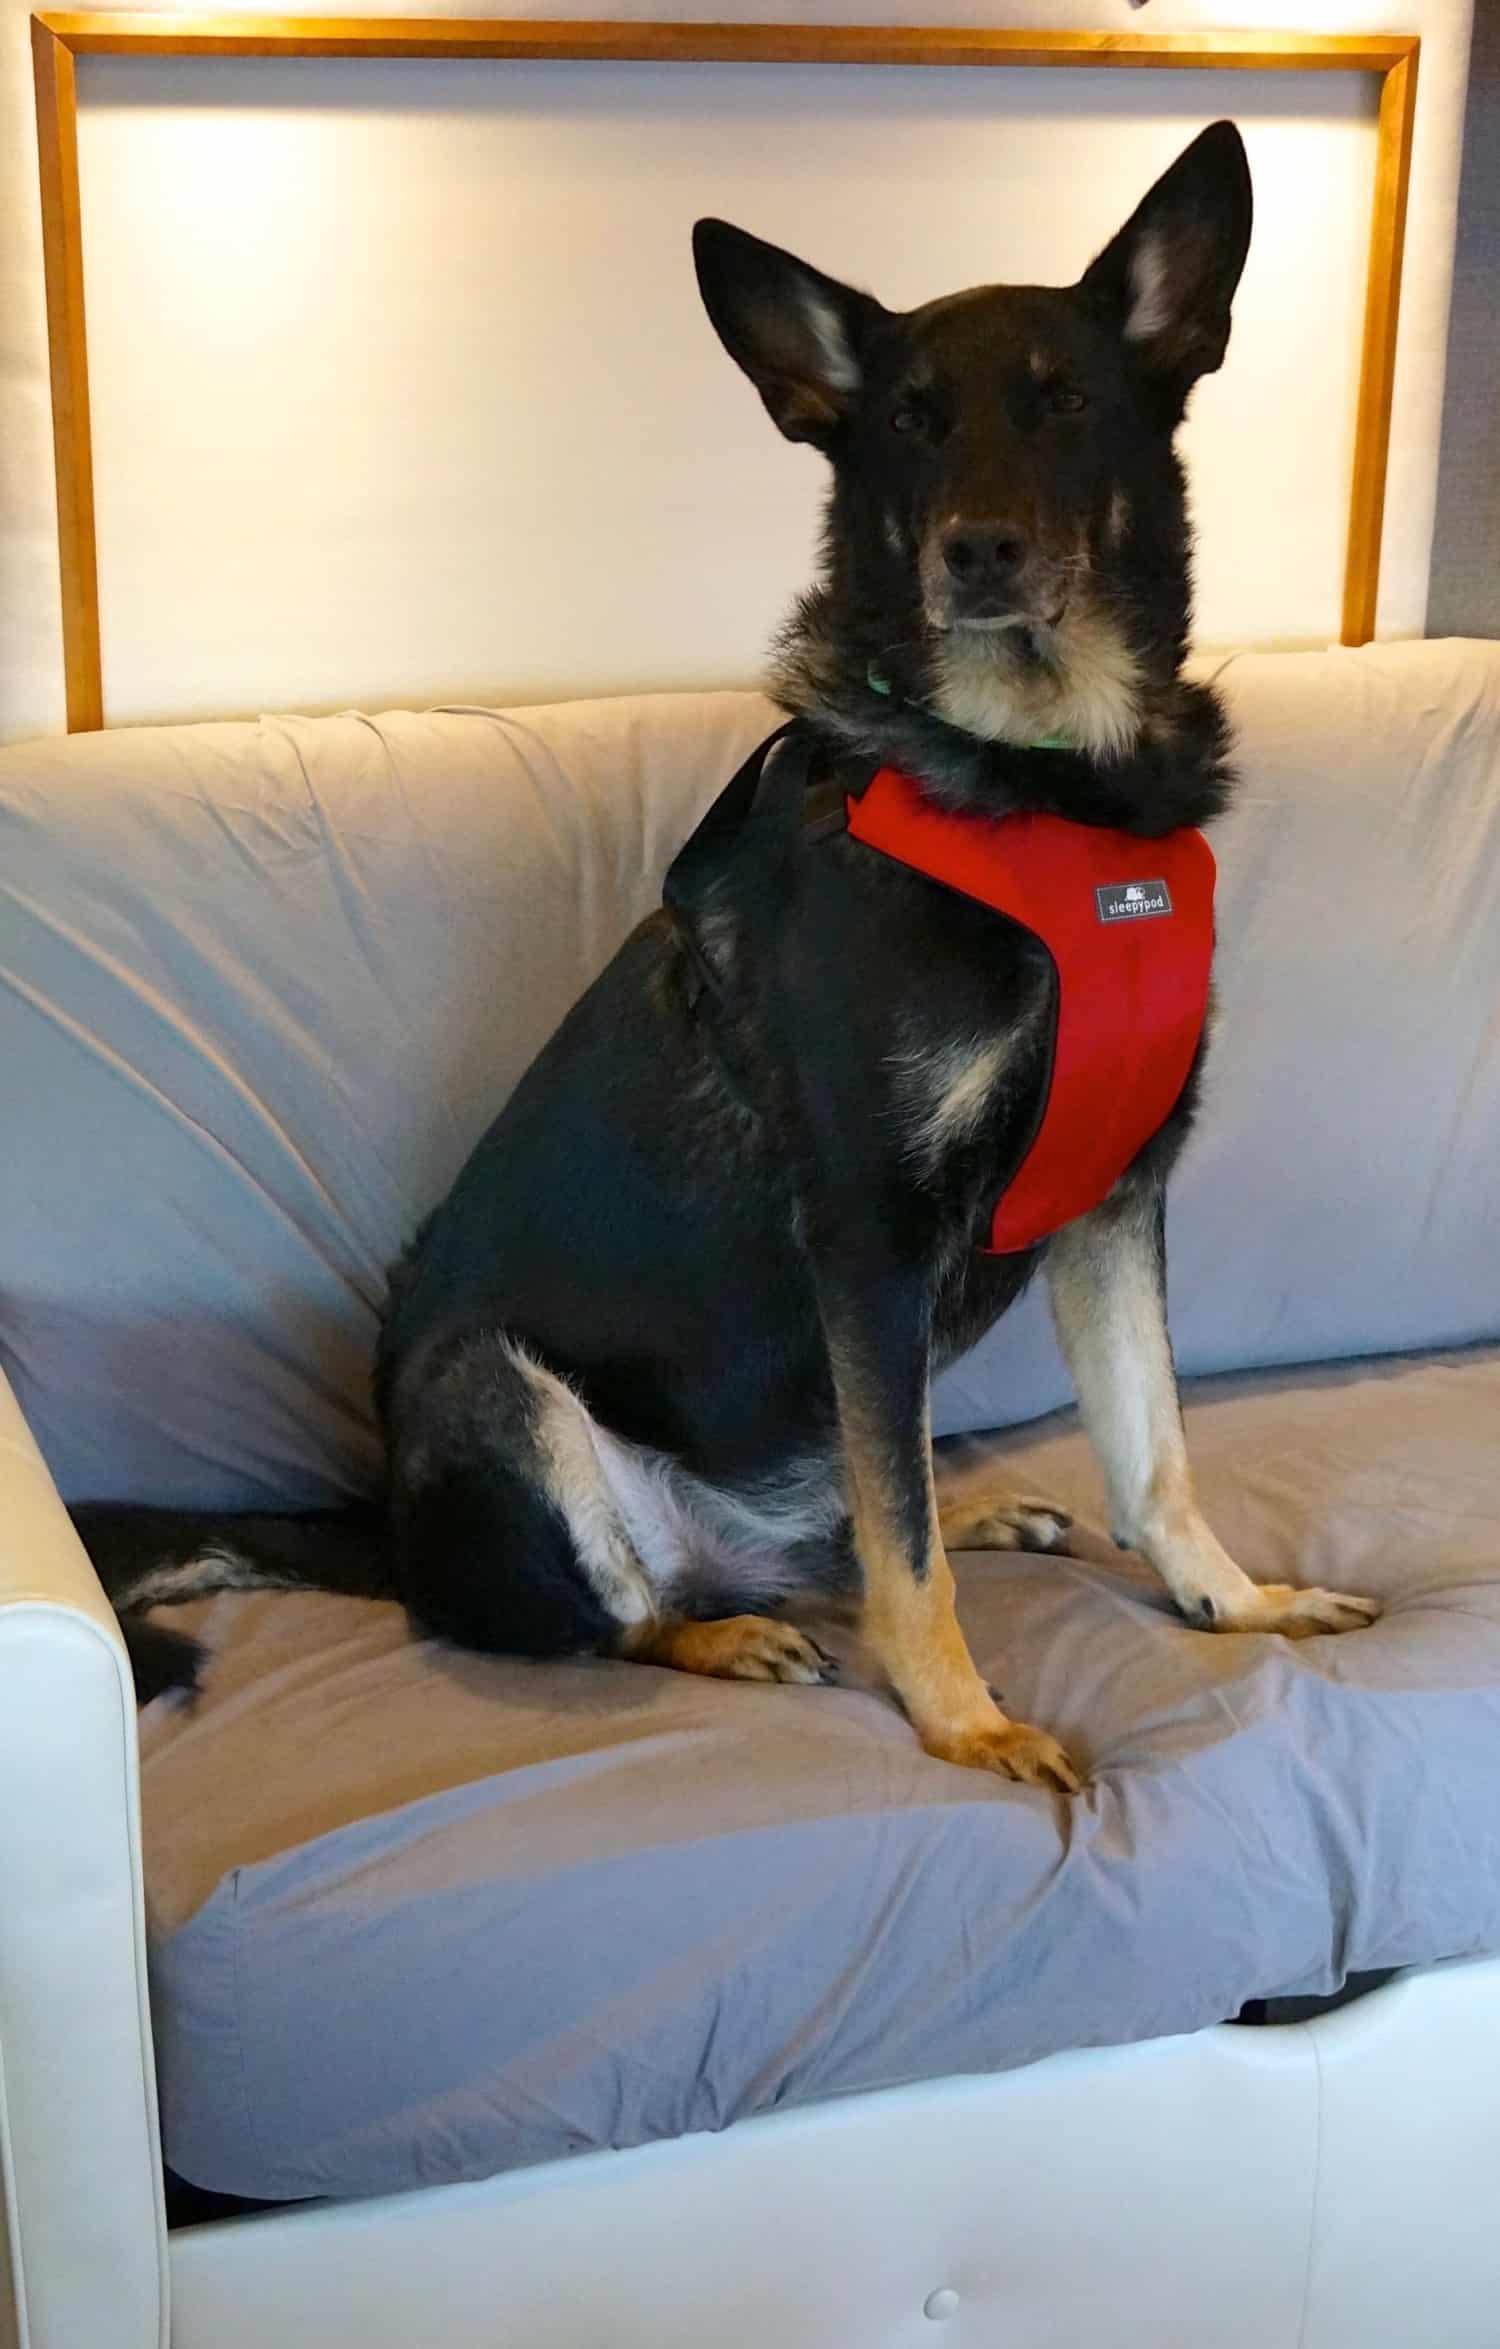 Black German Shepherd in a red crash-tested car harness